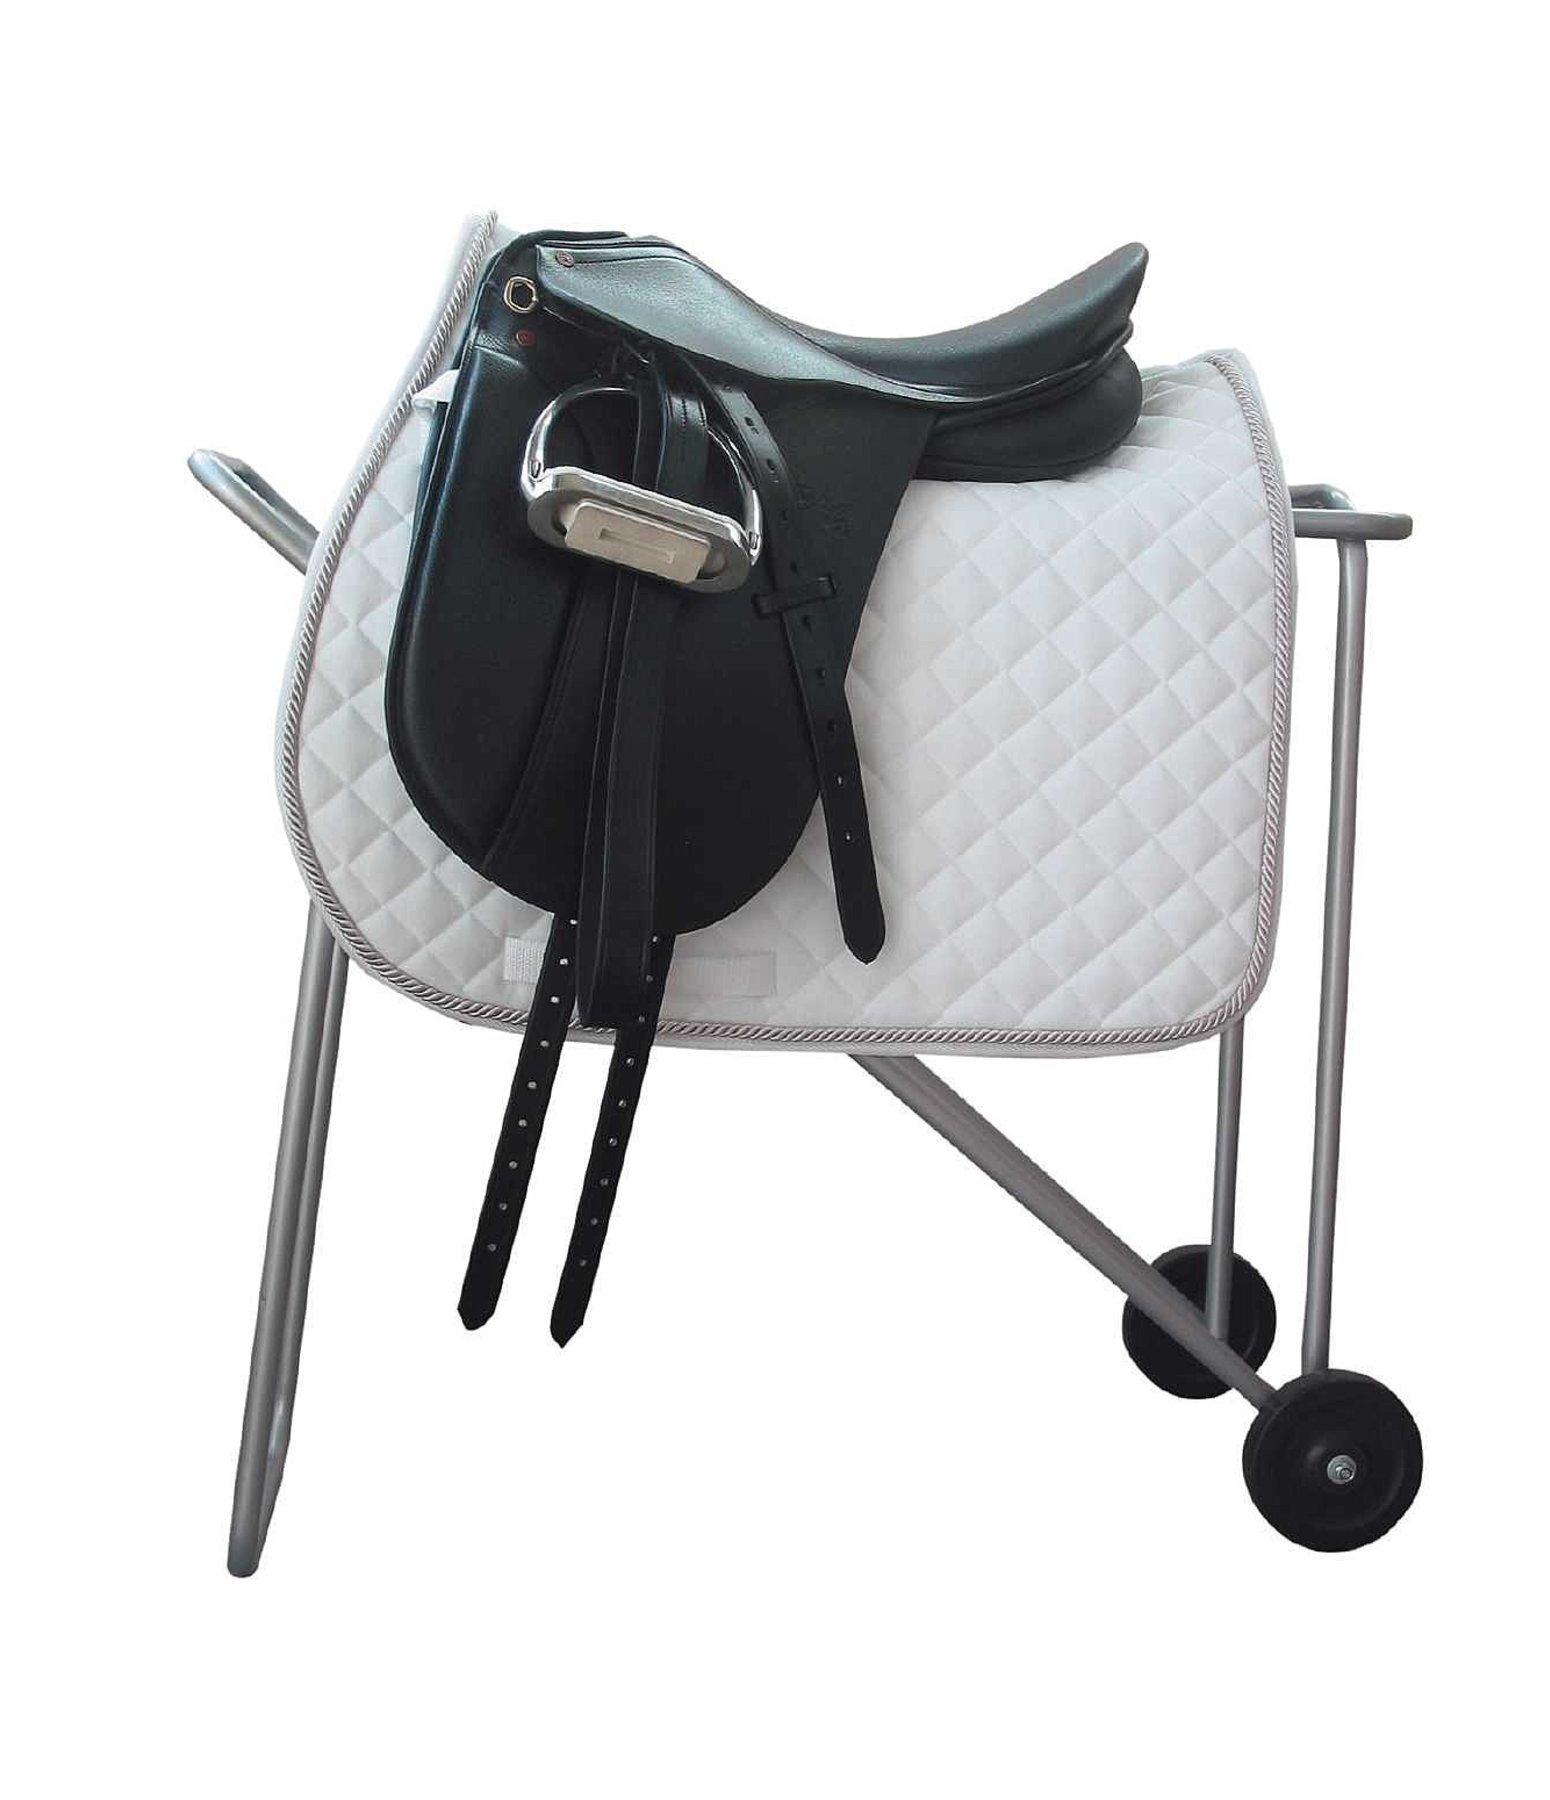 sattel caddy sattelkammer kr mer pferdesport. Black Bedroom Furniture Sets. Home Design Ideas